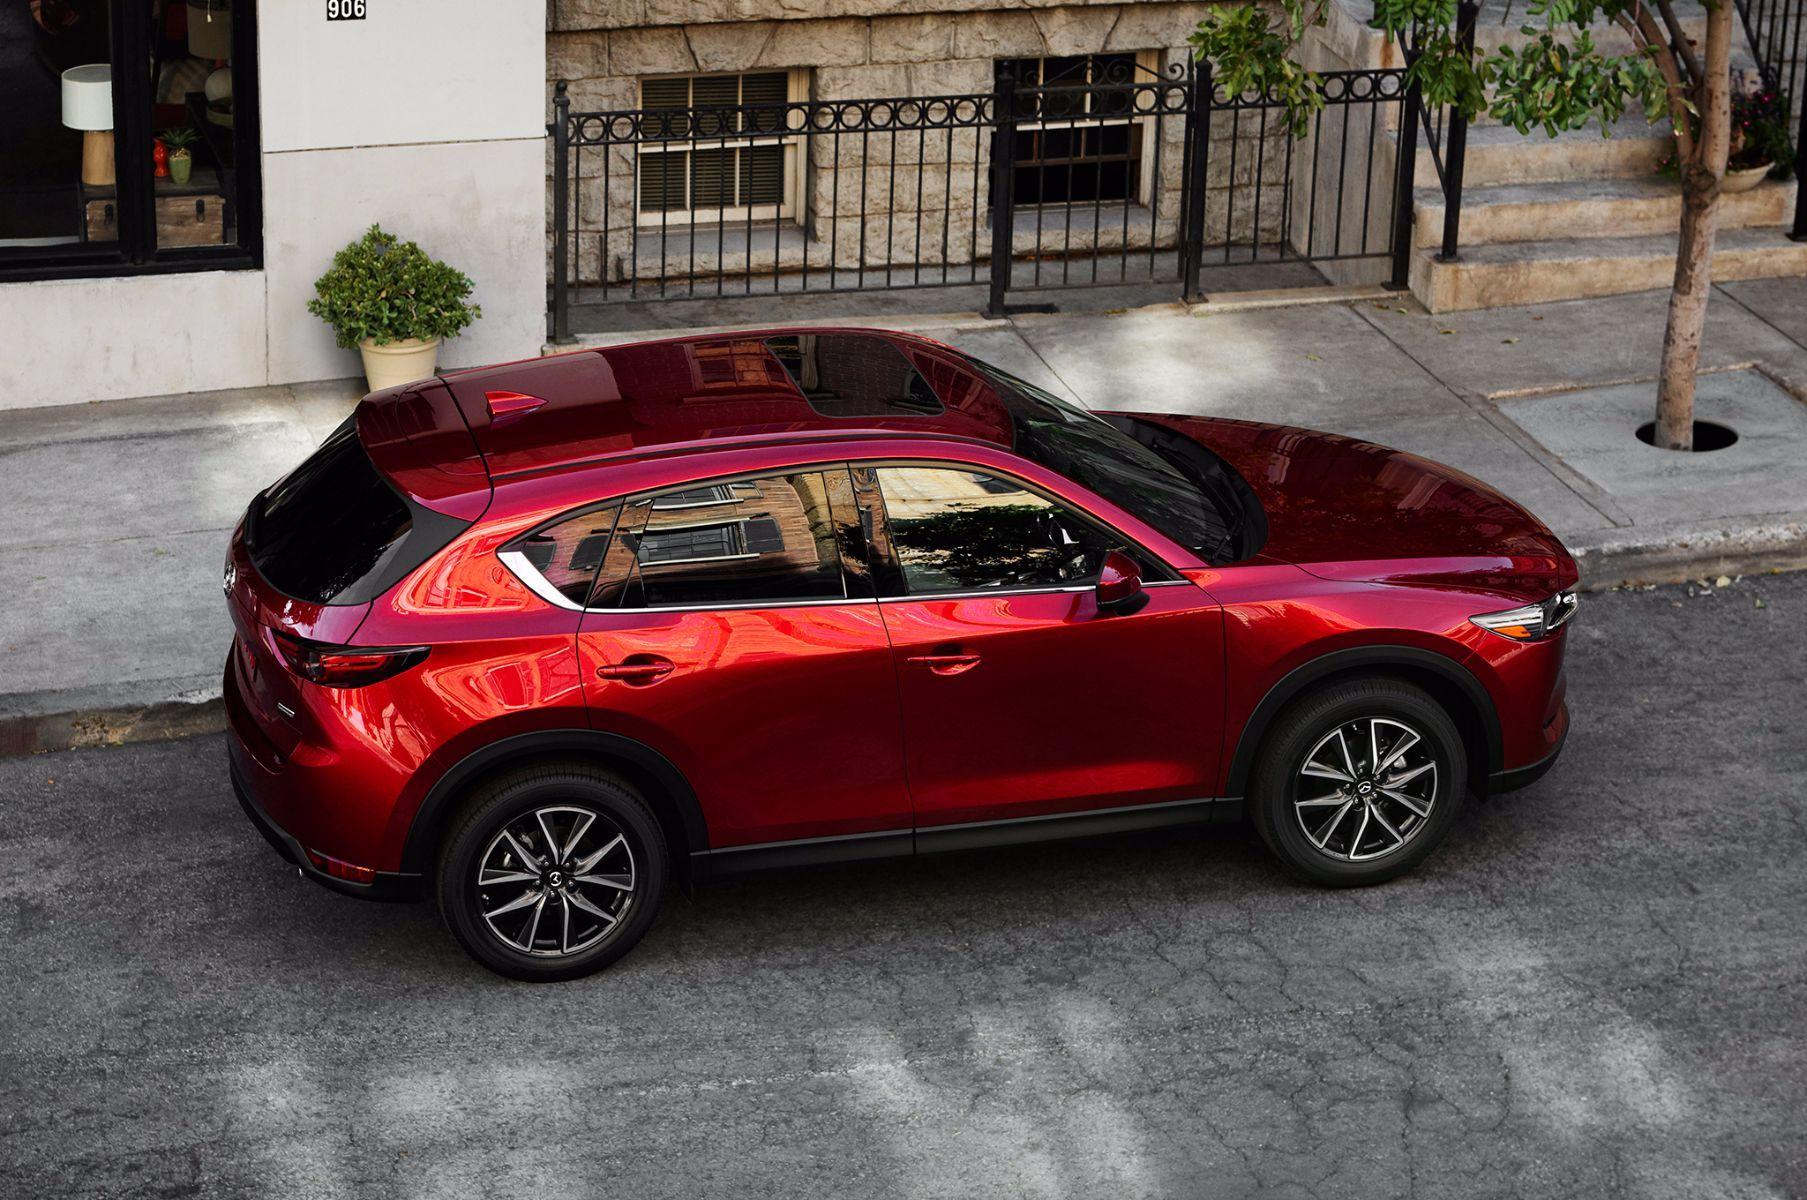 La popularité de Mazda ne cesse d'augmenter!